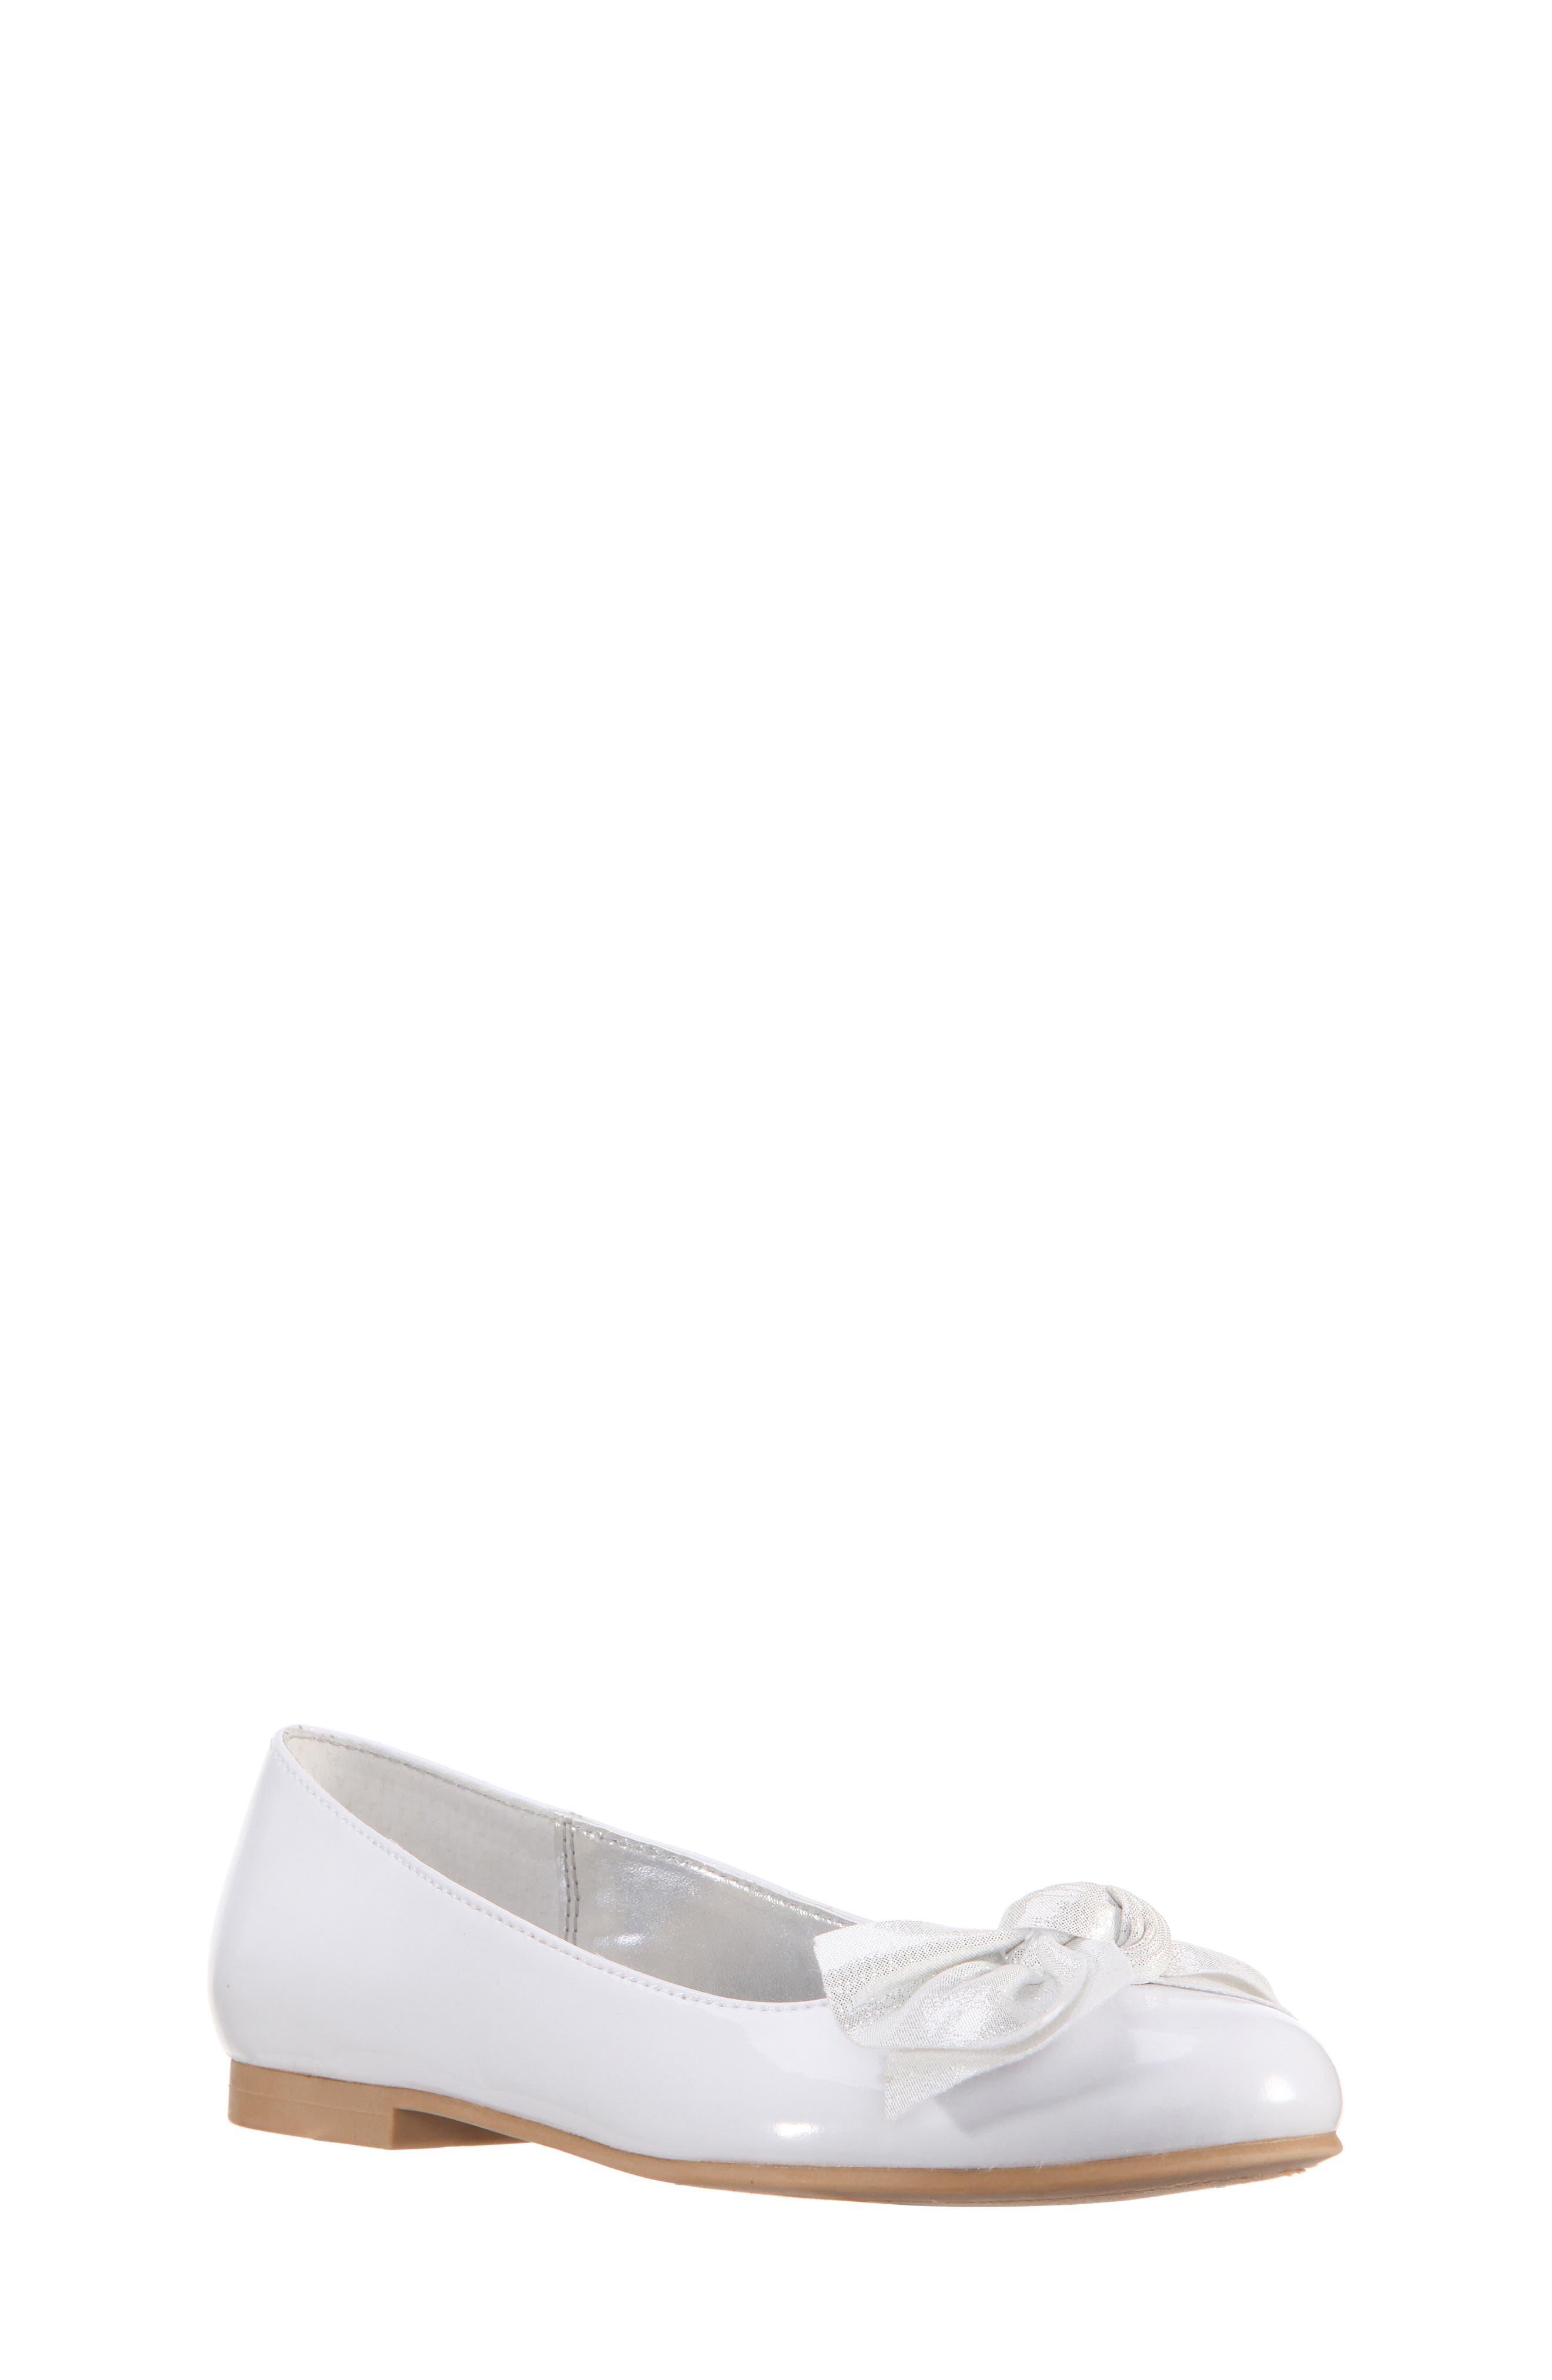 Katelyn Glitter Bow Metallic Ballet Flat,                             Main thumbnail 1, color,                             White Patent